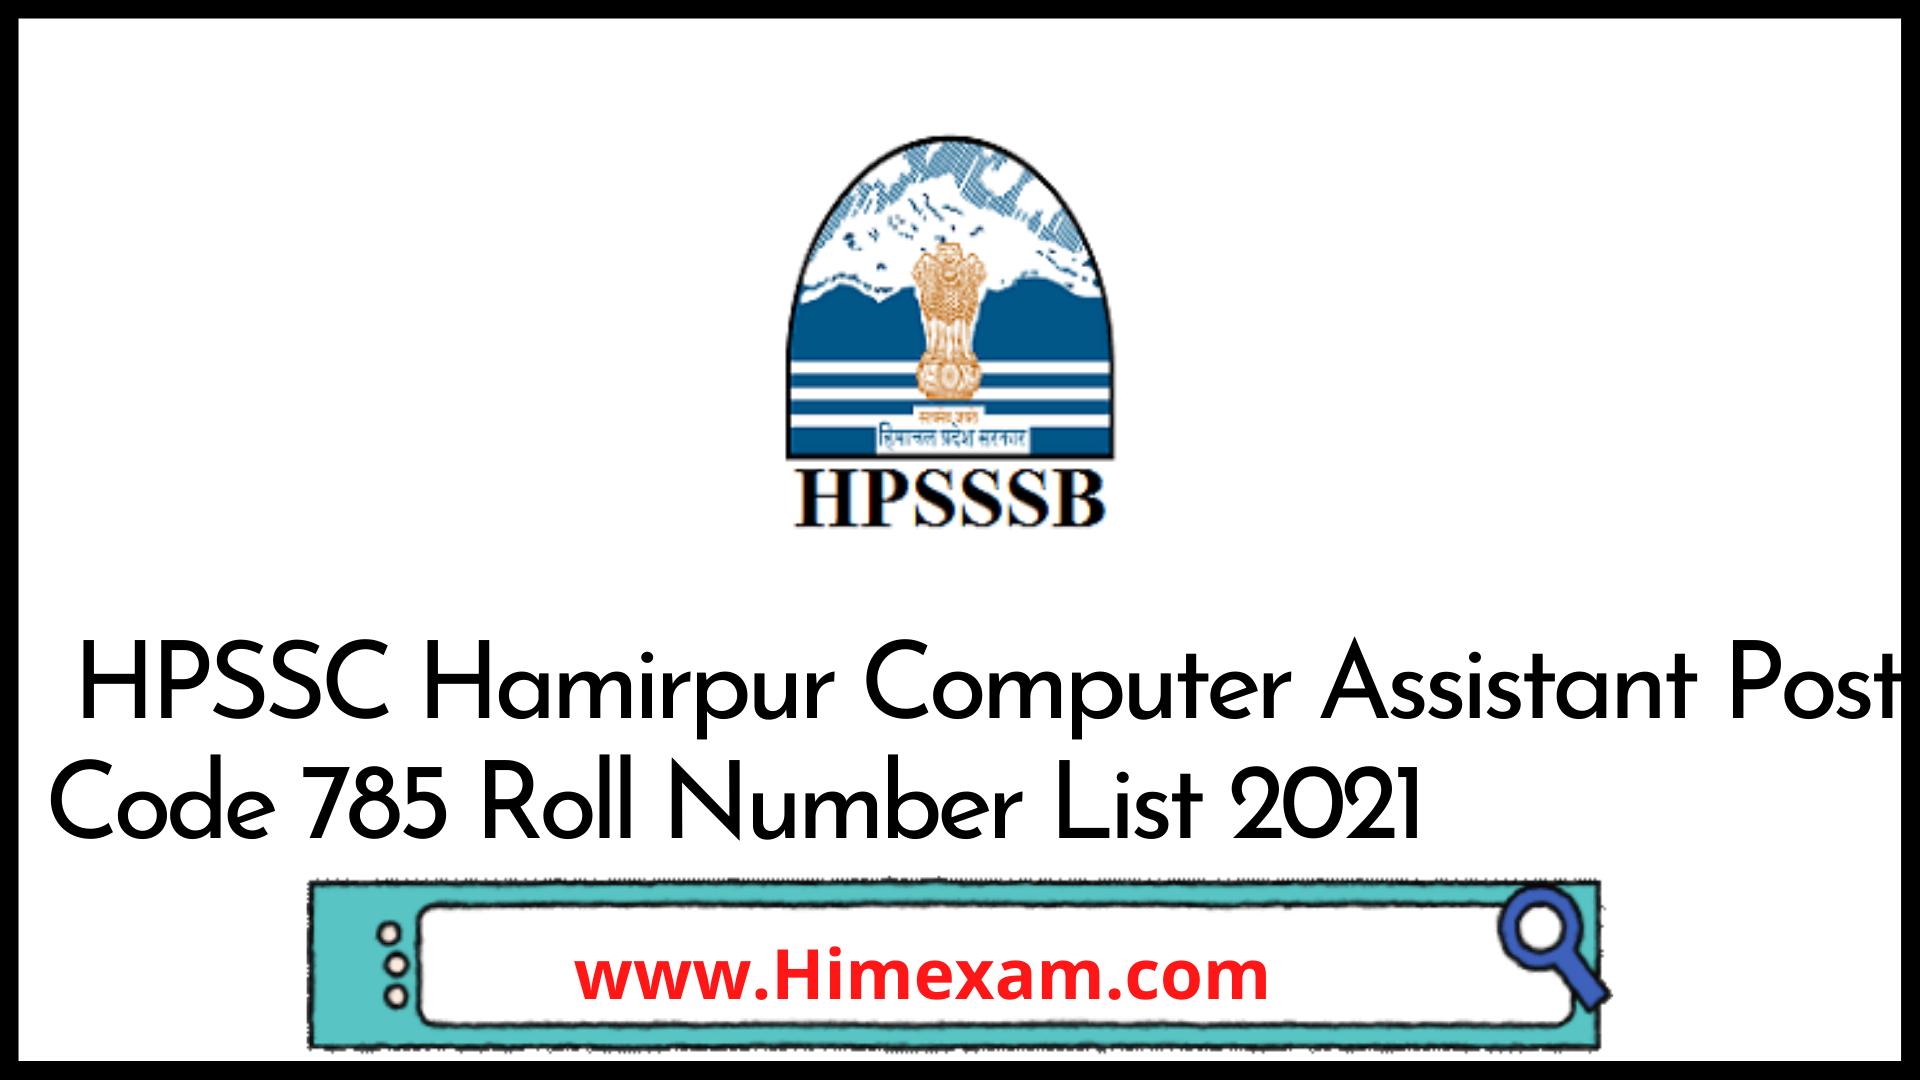 HPSSC Hamirpur Computer Assistant Post Code 785 Roll Number List 2021